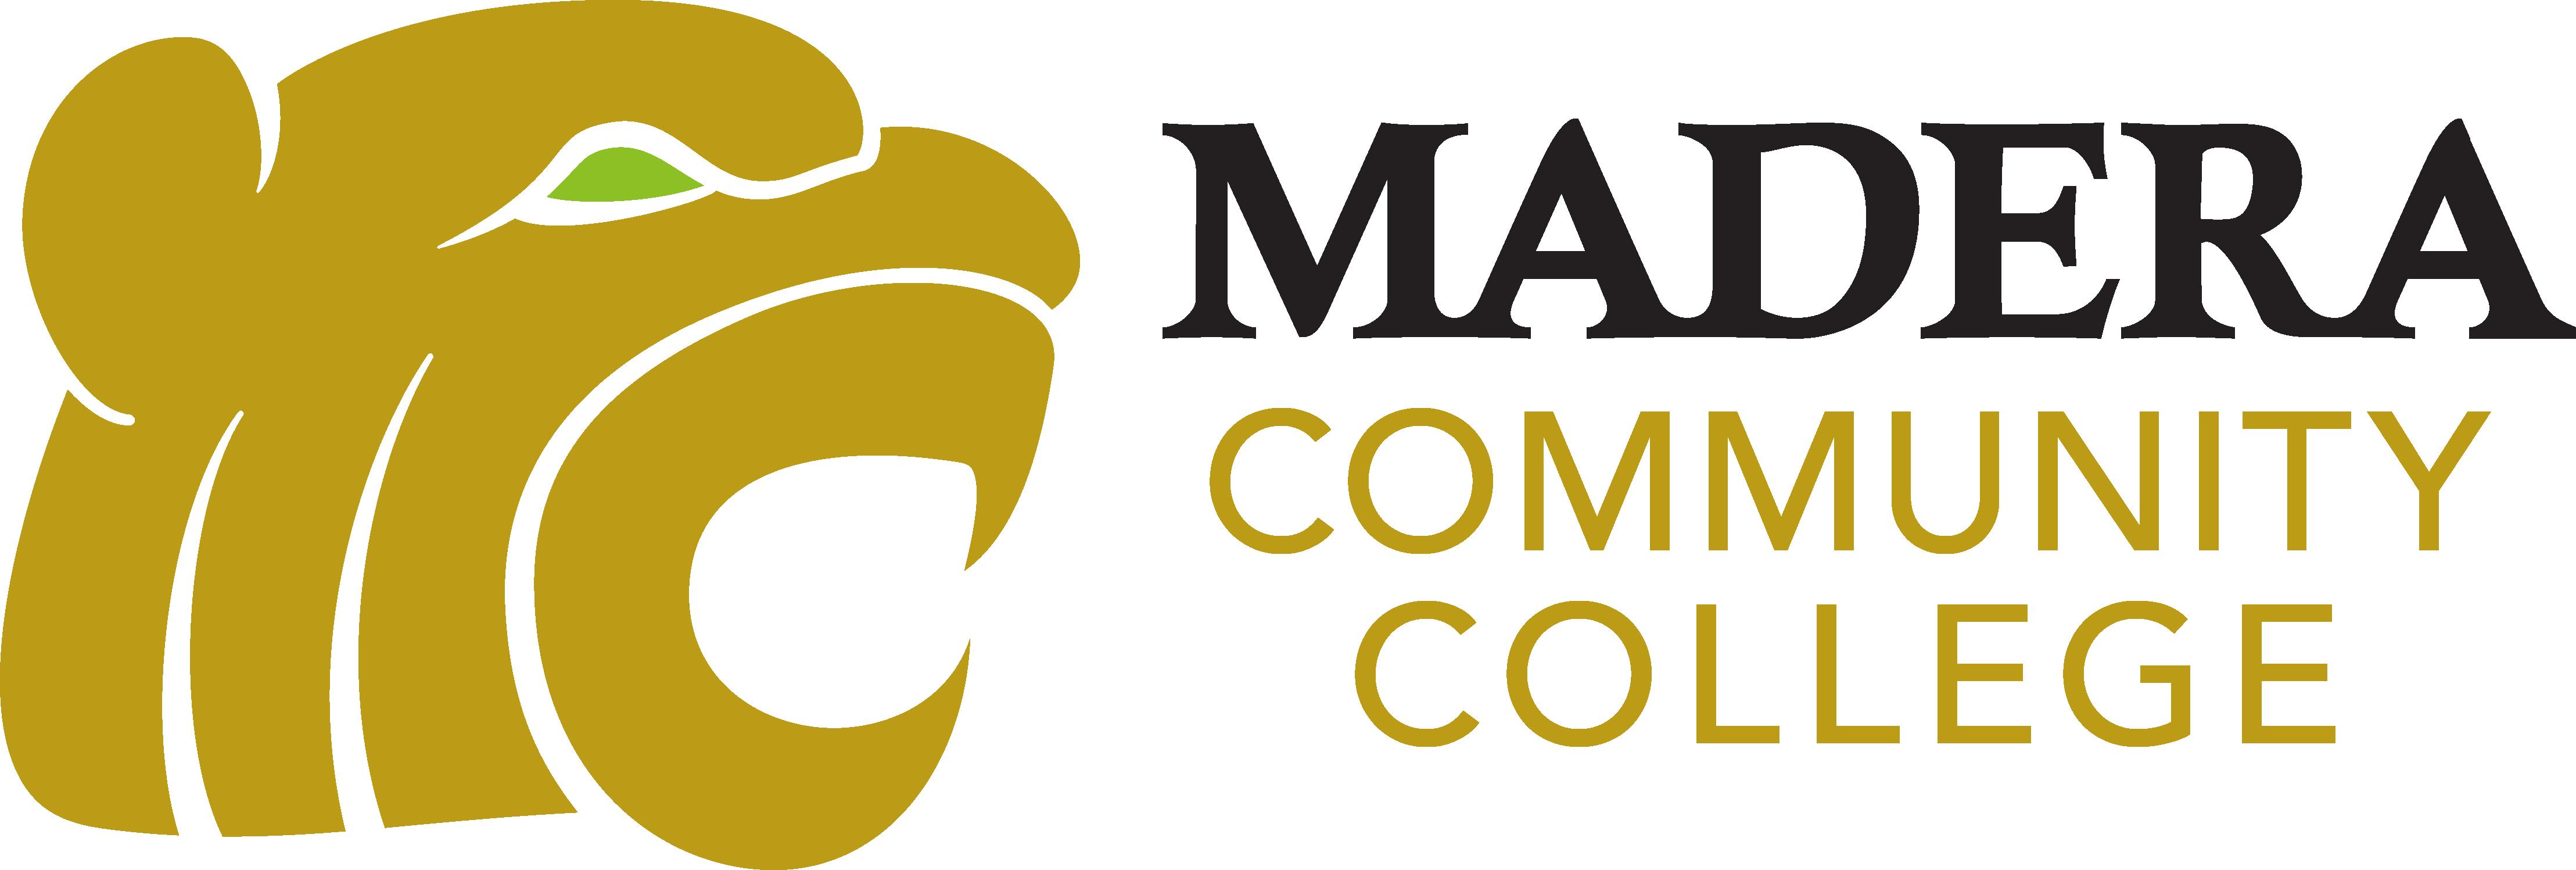 Madera Community College logo